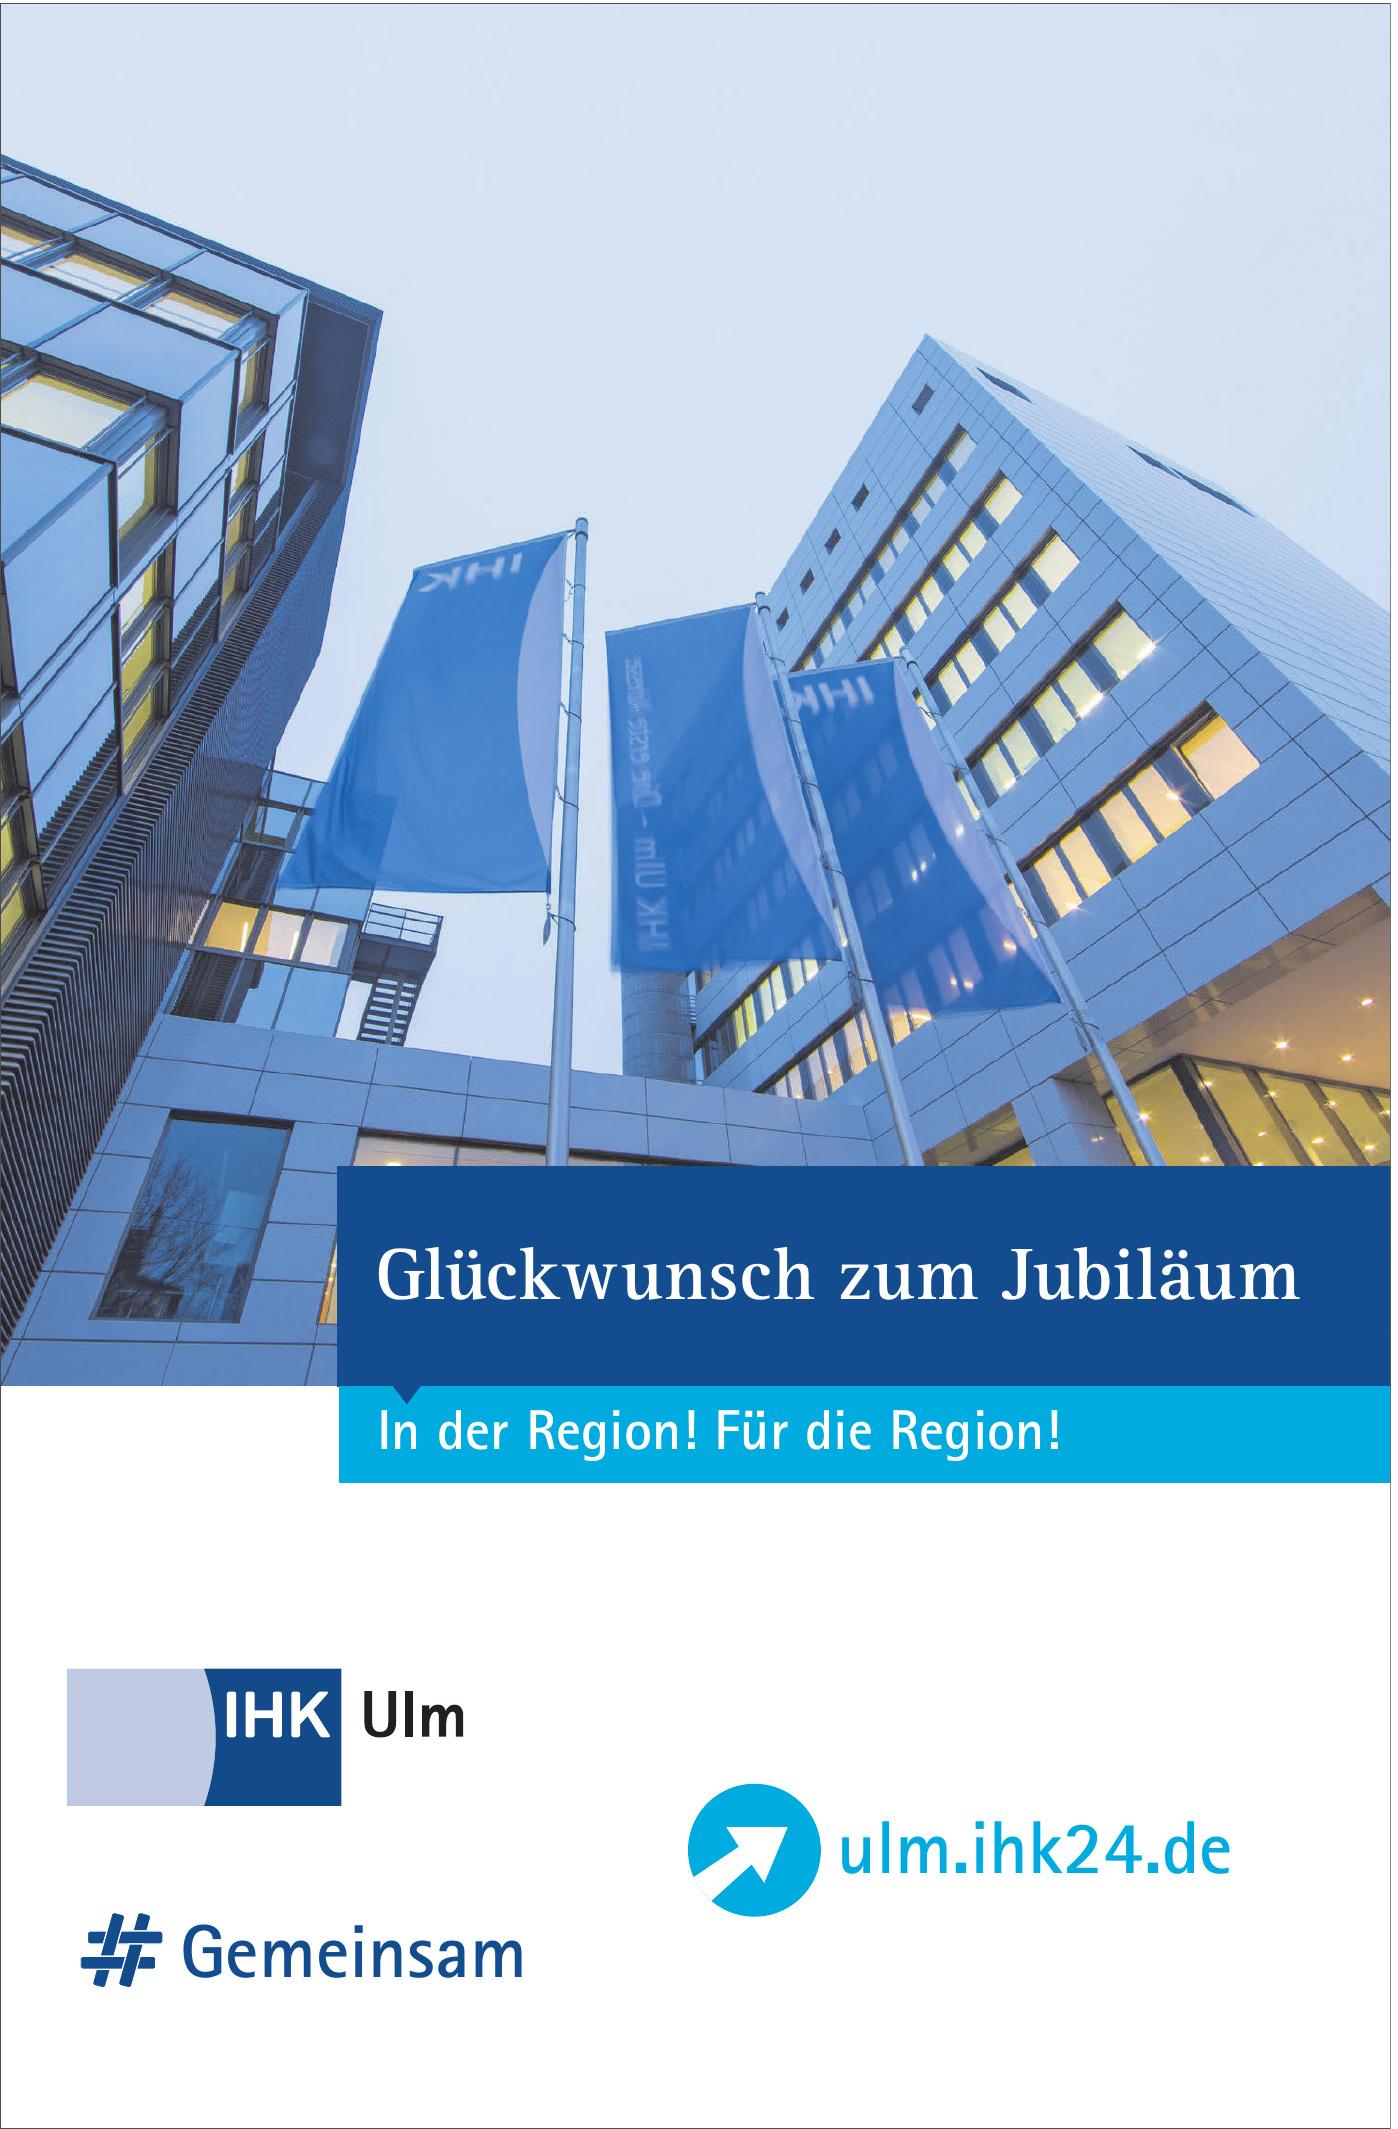 IHK Ulm